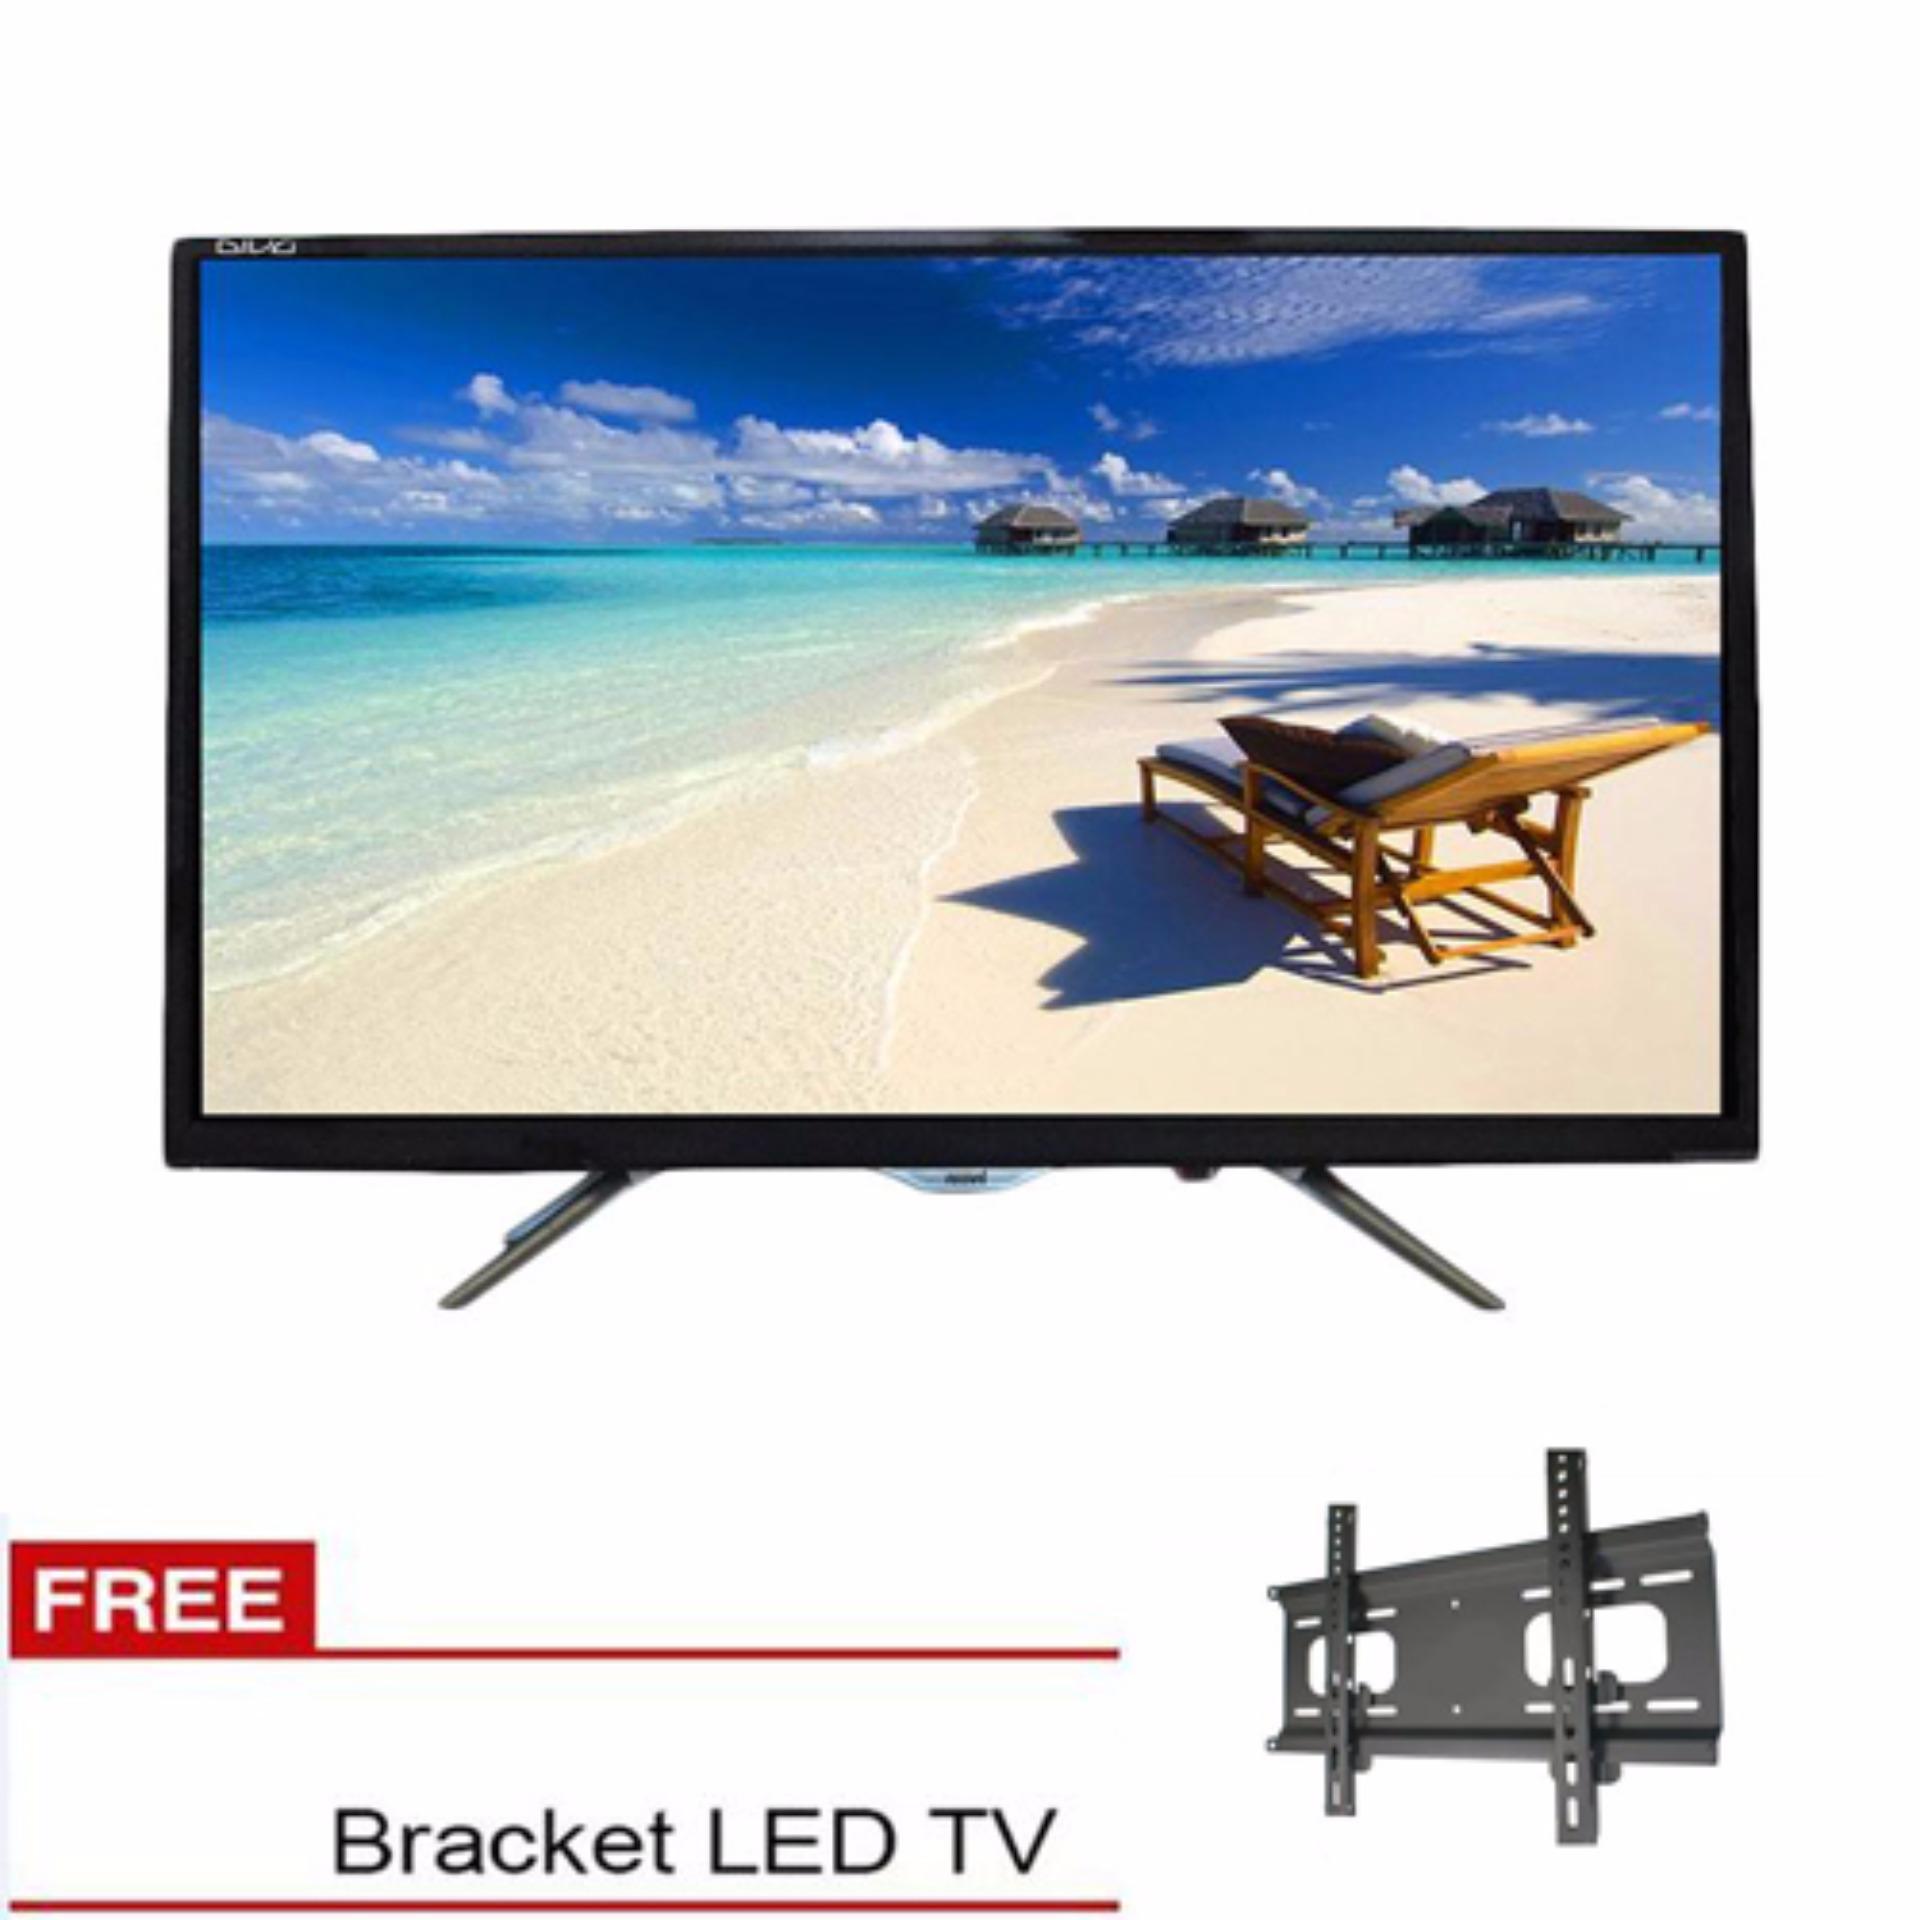 Akari Hd Ready Digital Led Tv 32 Le 3289t2 Free Bracket Hitam Remote